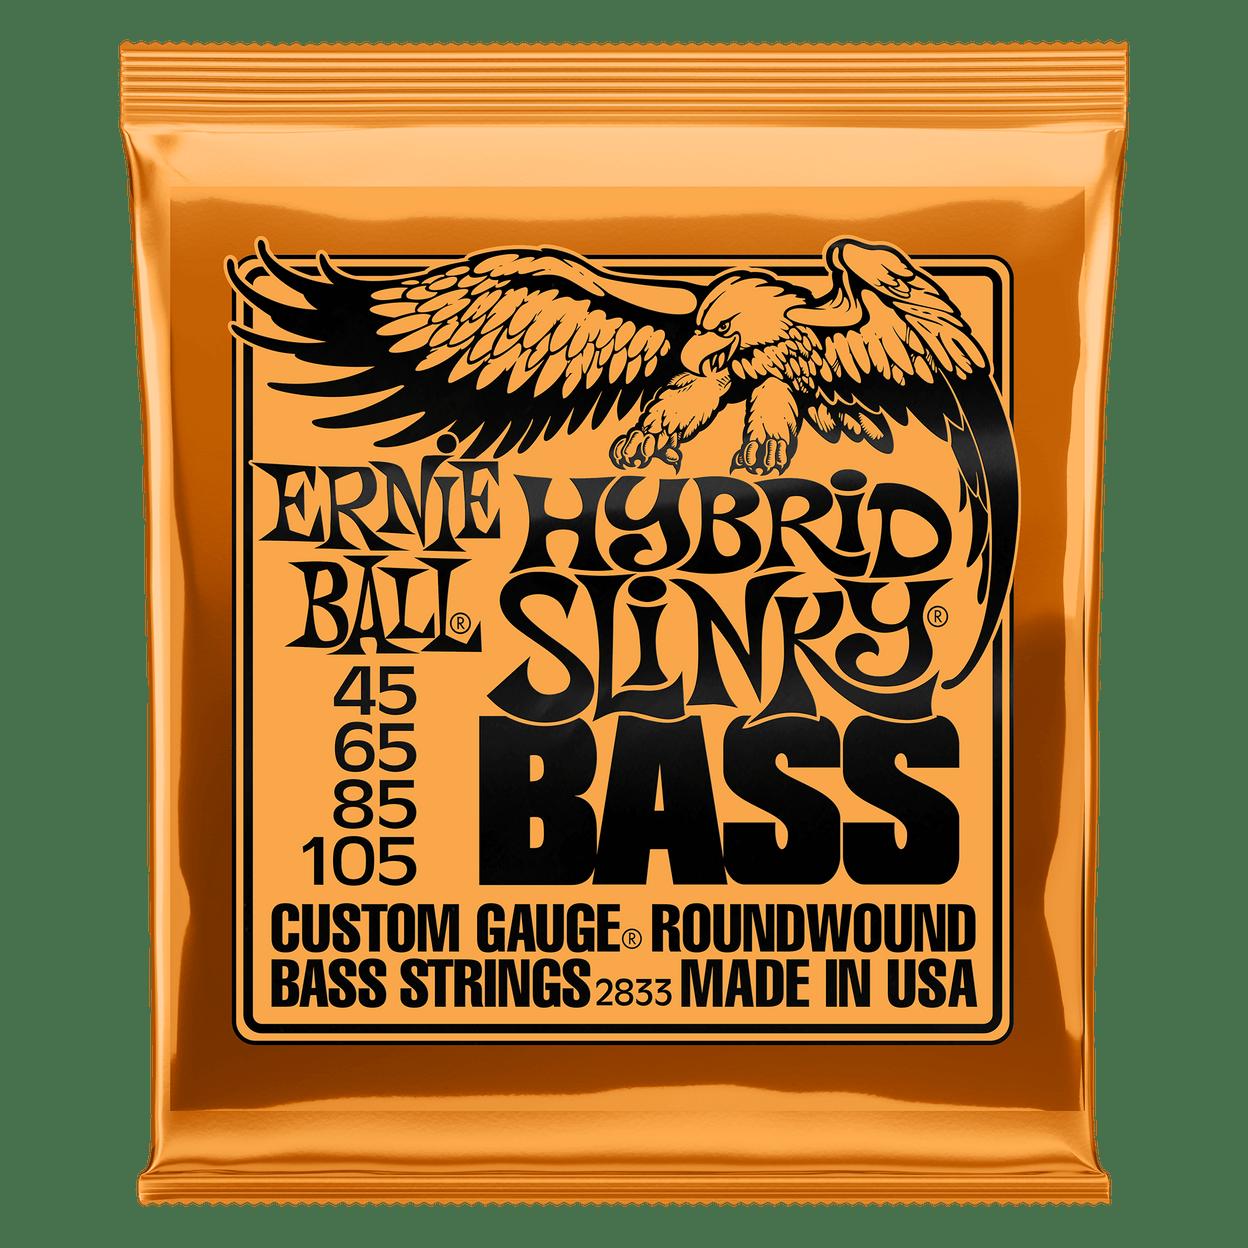 Купить Ernie Ball 2833 Hybrid Slinky Nickel Wound Bass 45-105